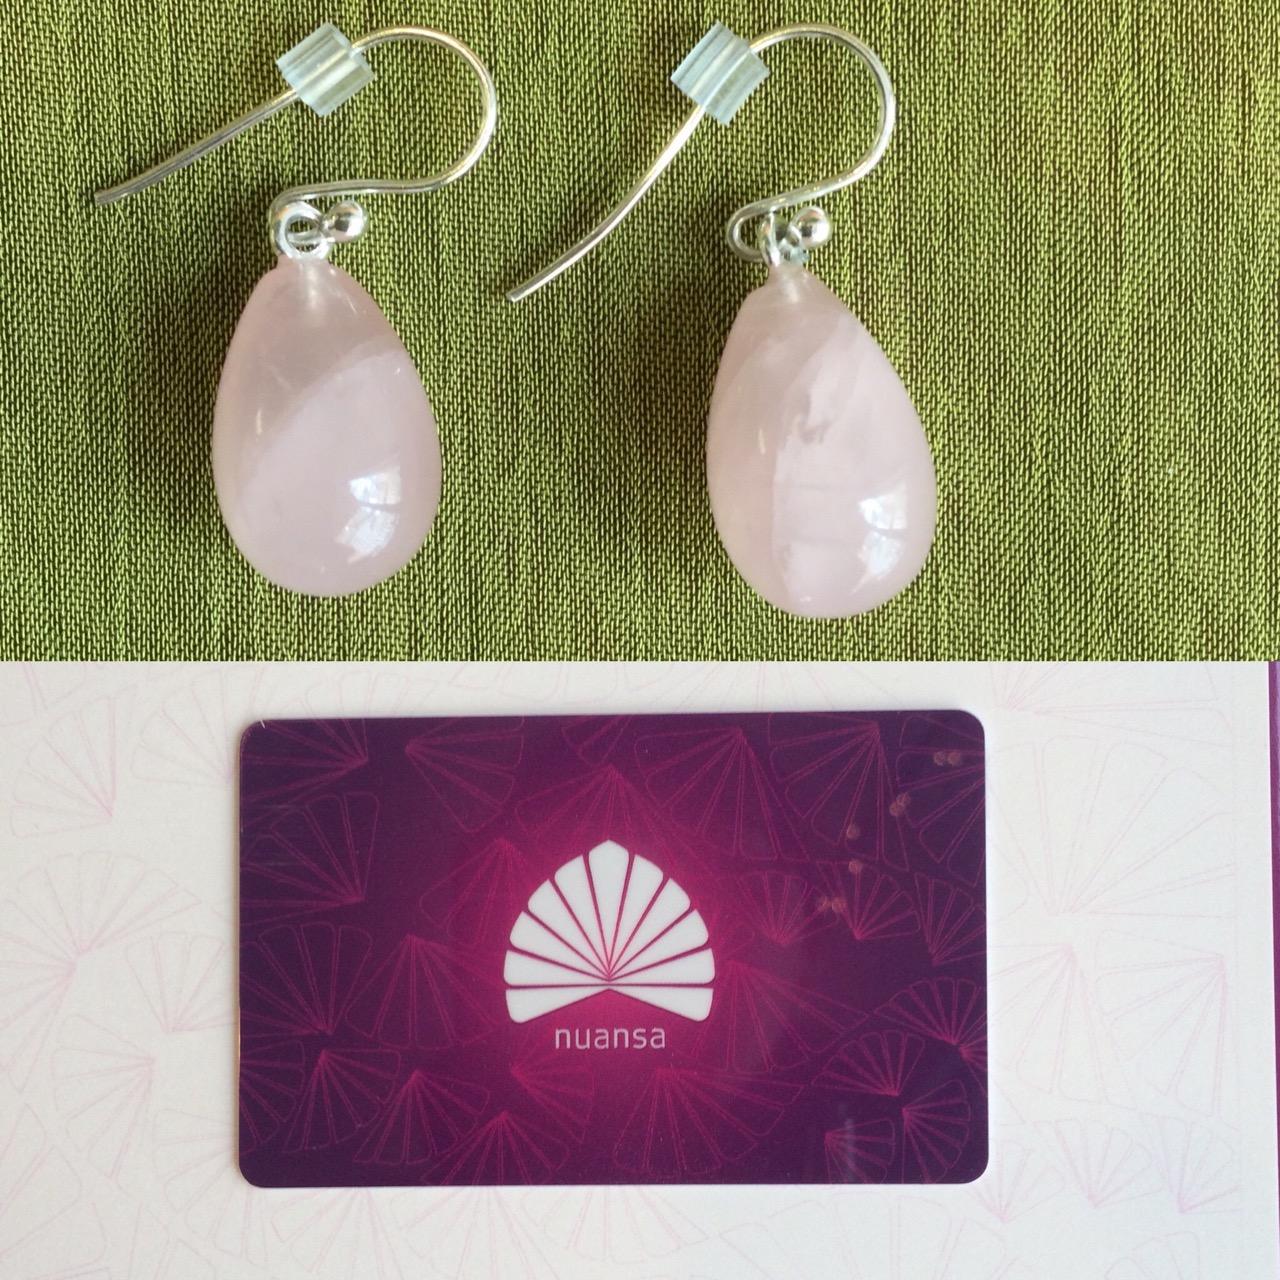 Auction Item 02: Roze Quartz Earrings by  Jeweler VeryNYC  +  Nuansa Spa  Gift Card  Value earrings: $70.--  Value Nuansa Spa gift card: $200.--  Earrings made by  Ray Anne School from VeryNYC.   Gift card by  Nuansa Spa .